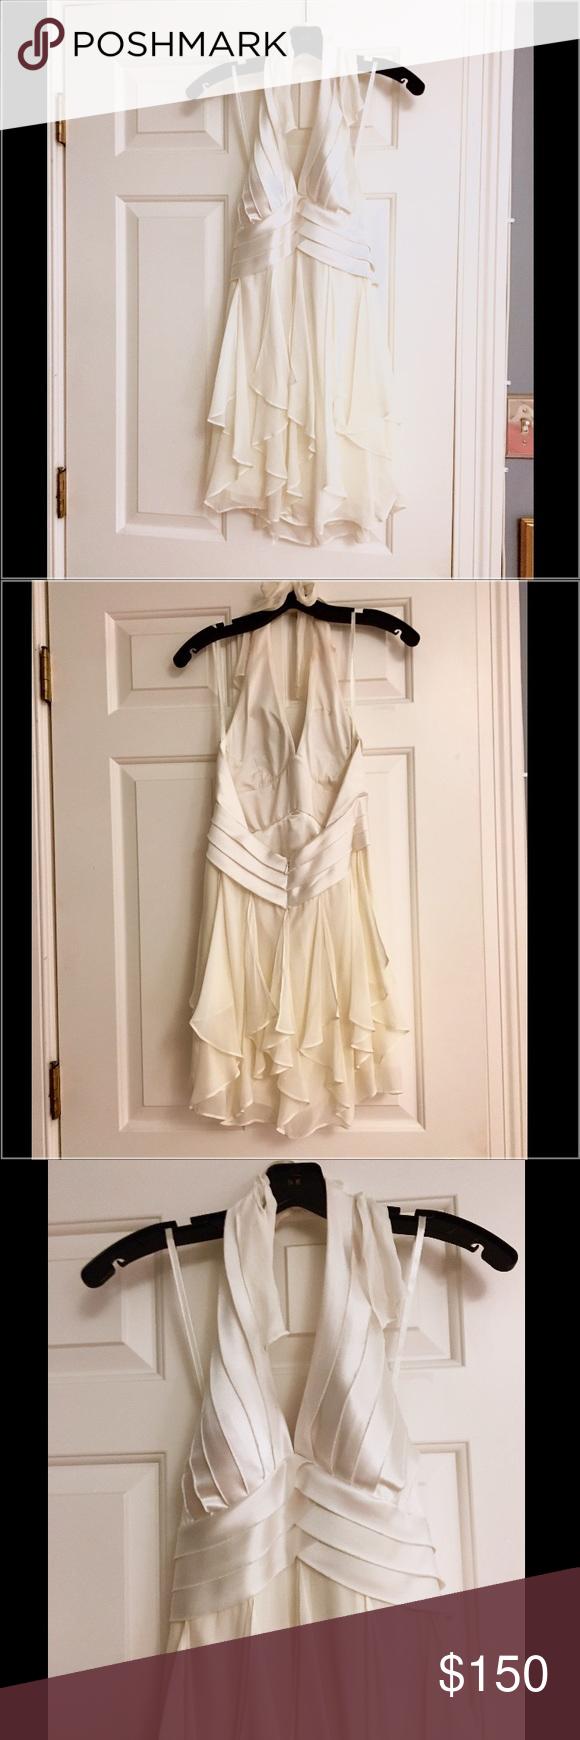 Bcbgmaxazria White Cocktail Dress White Cocktail Dress Marilyn Monroe Fashion Dresses [ 1740 x 580 Pixel ]